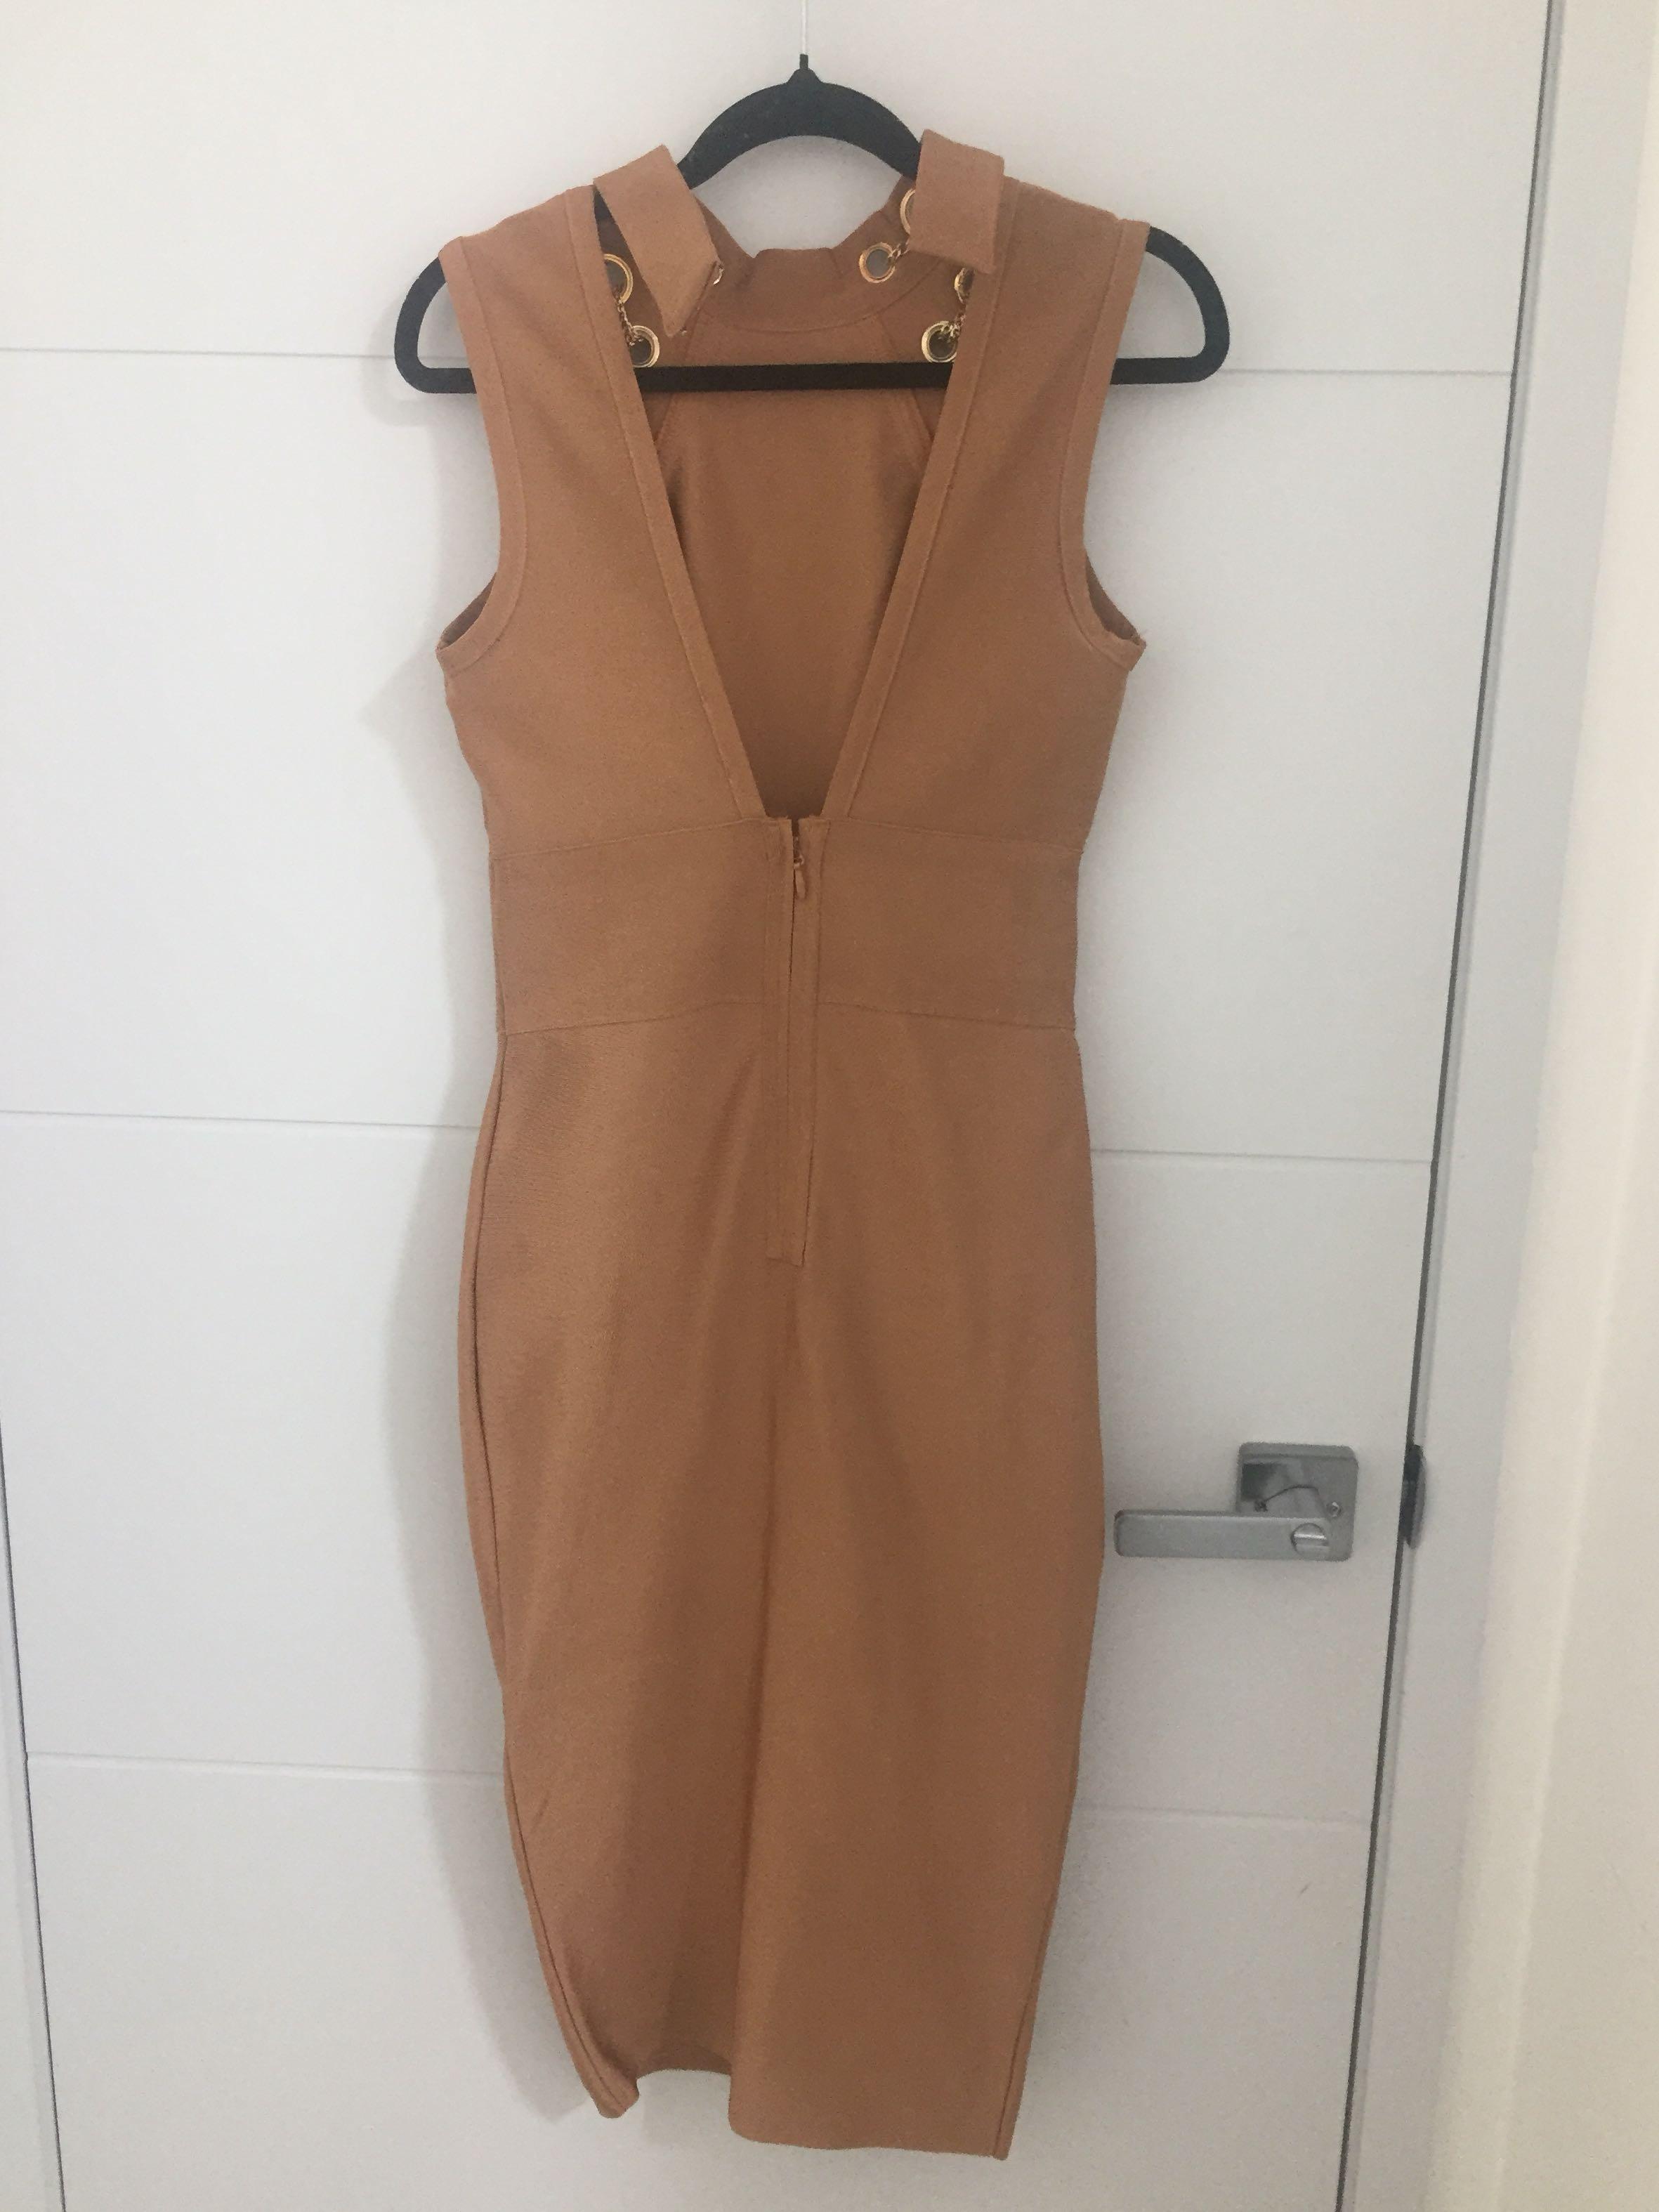 Mocha Middi Bandage Dress S Fashion Nova brand new with tags